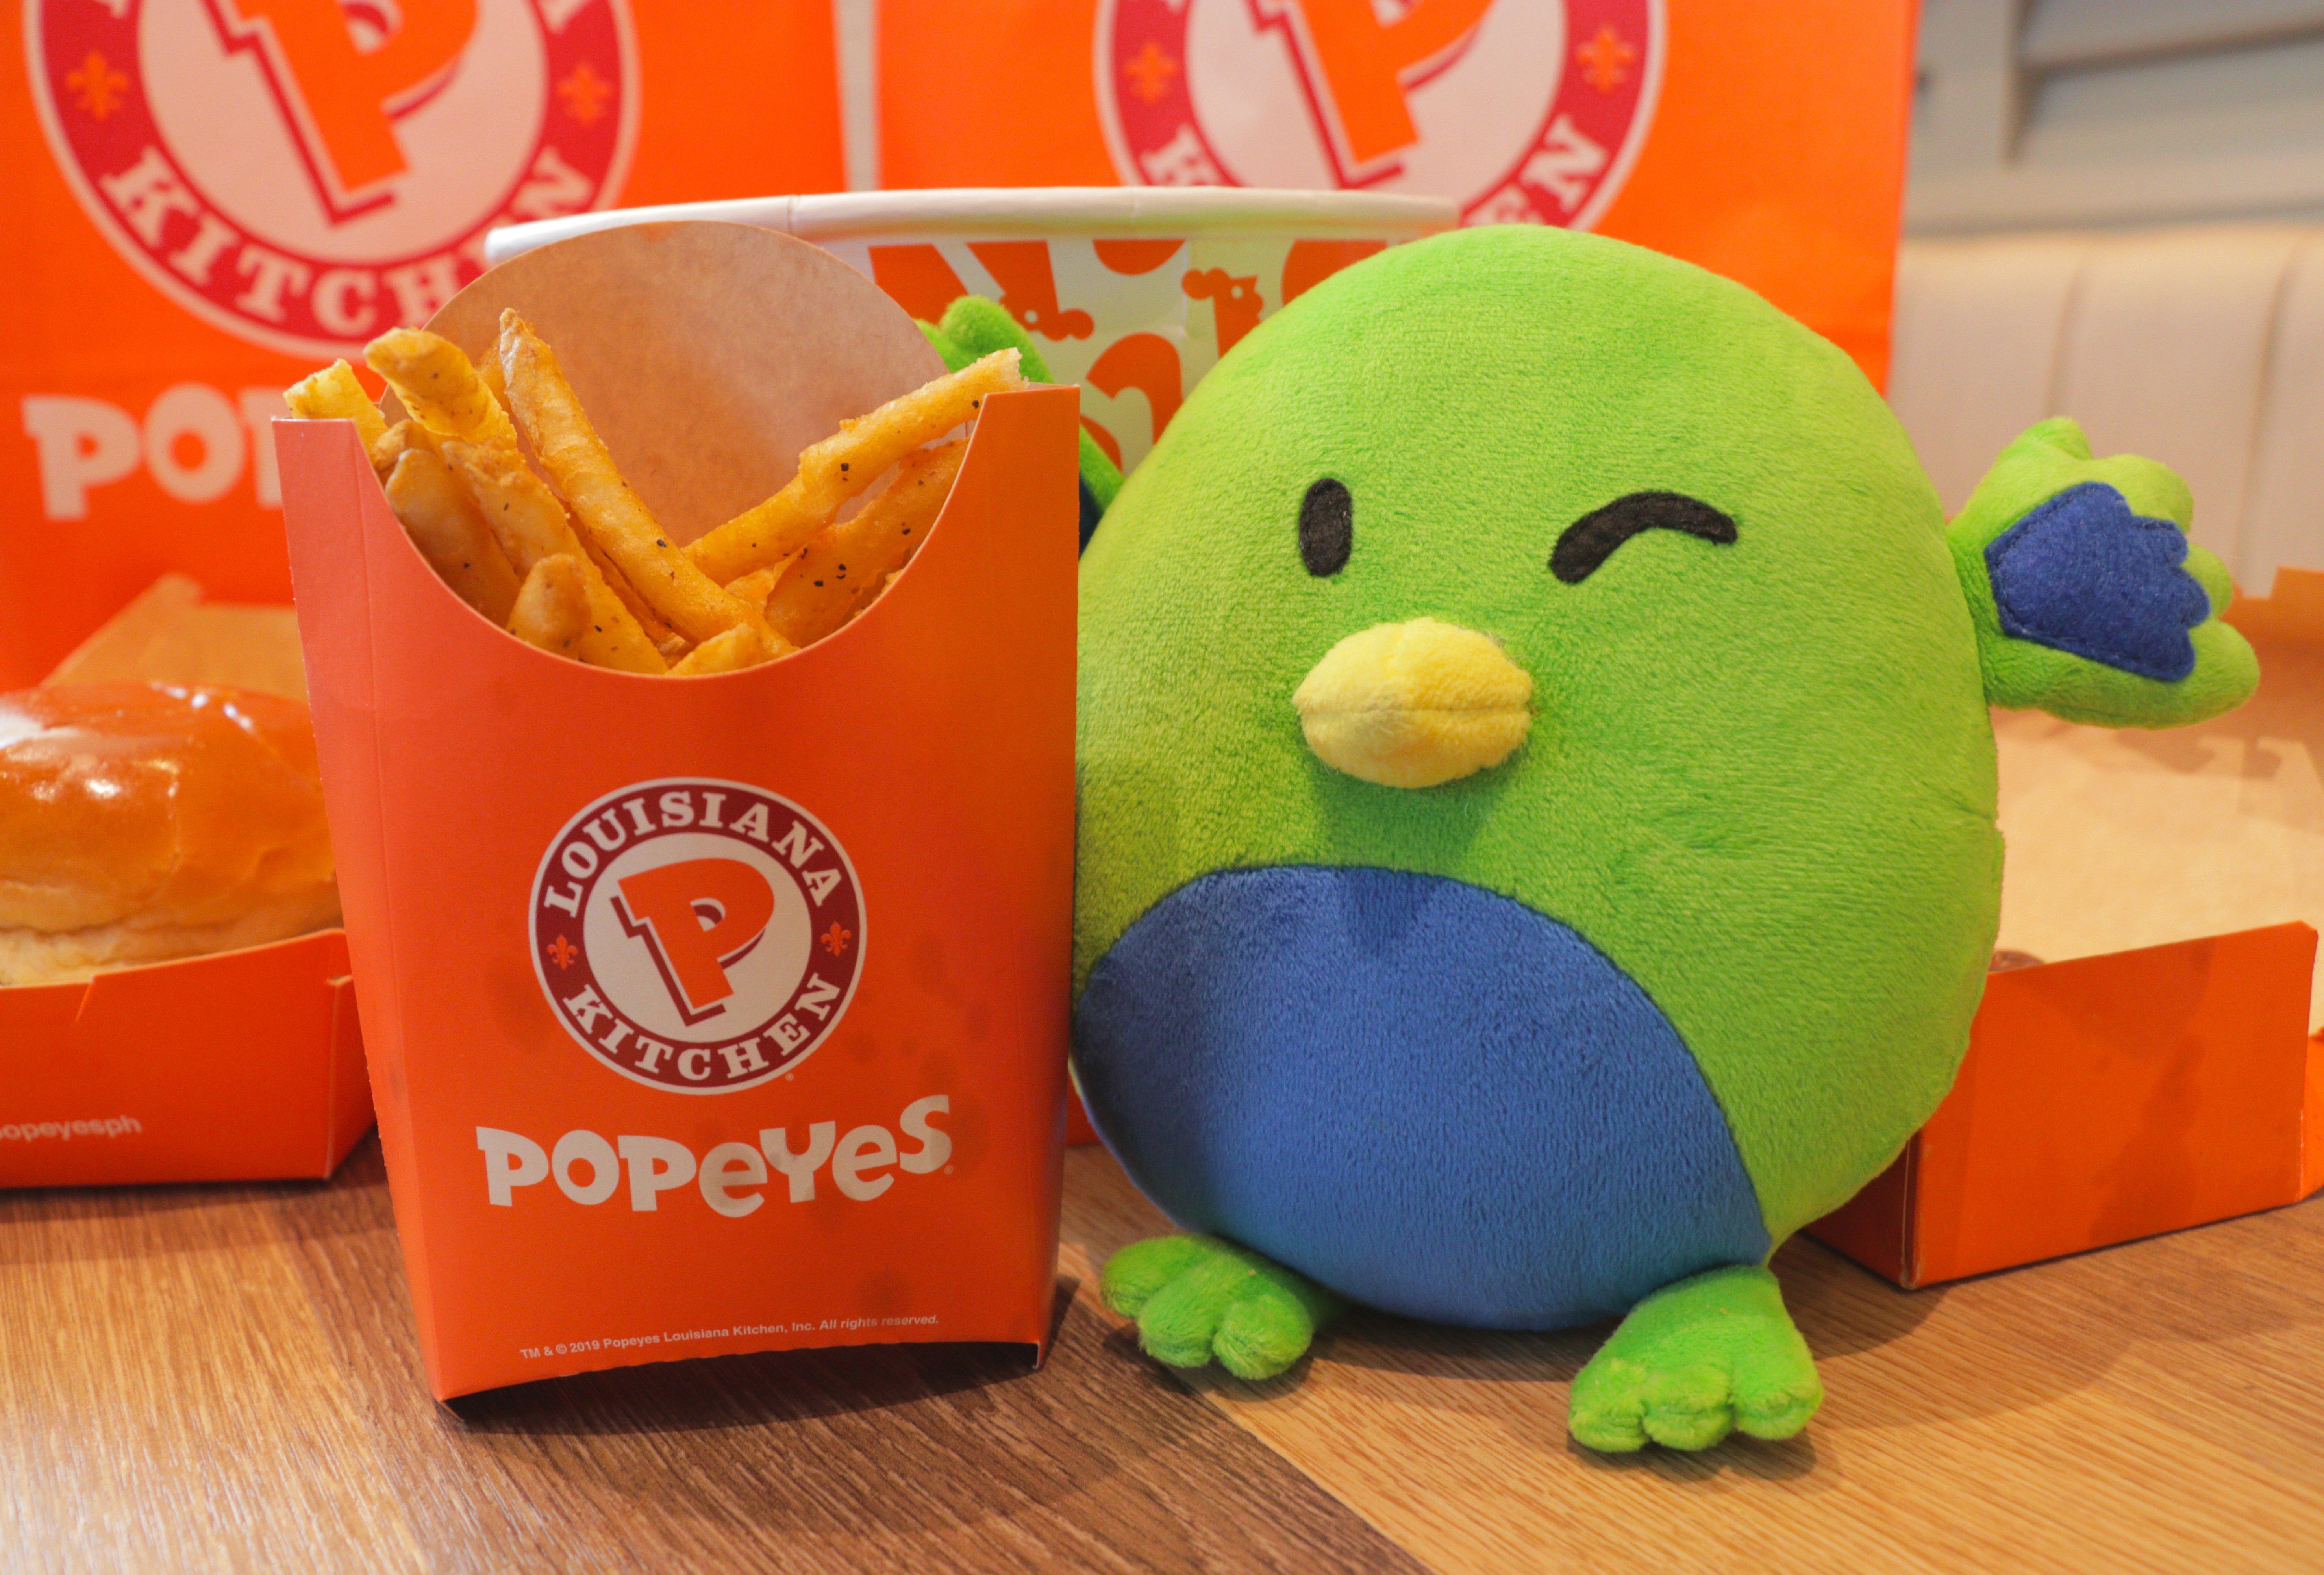 _1 Fries